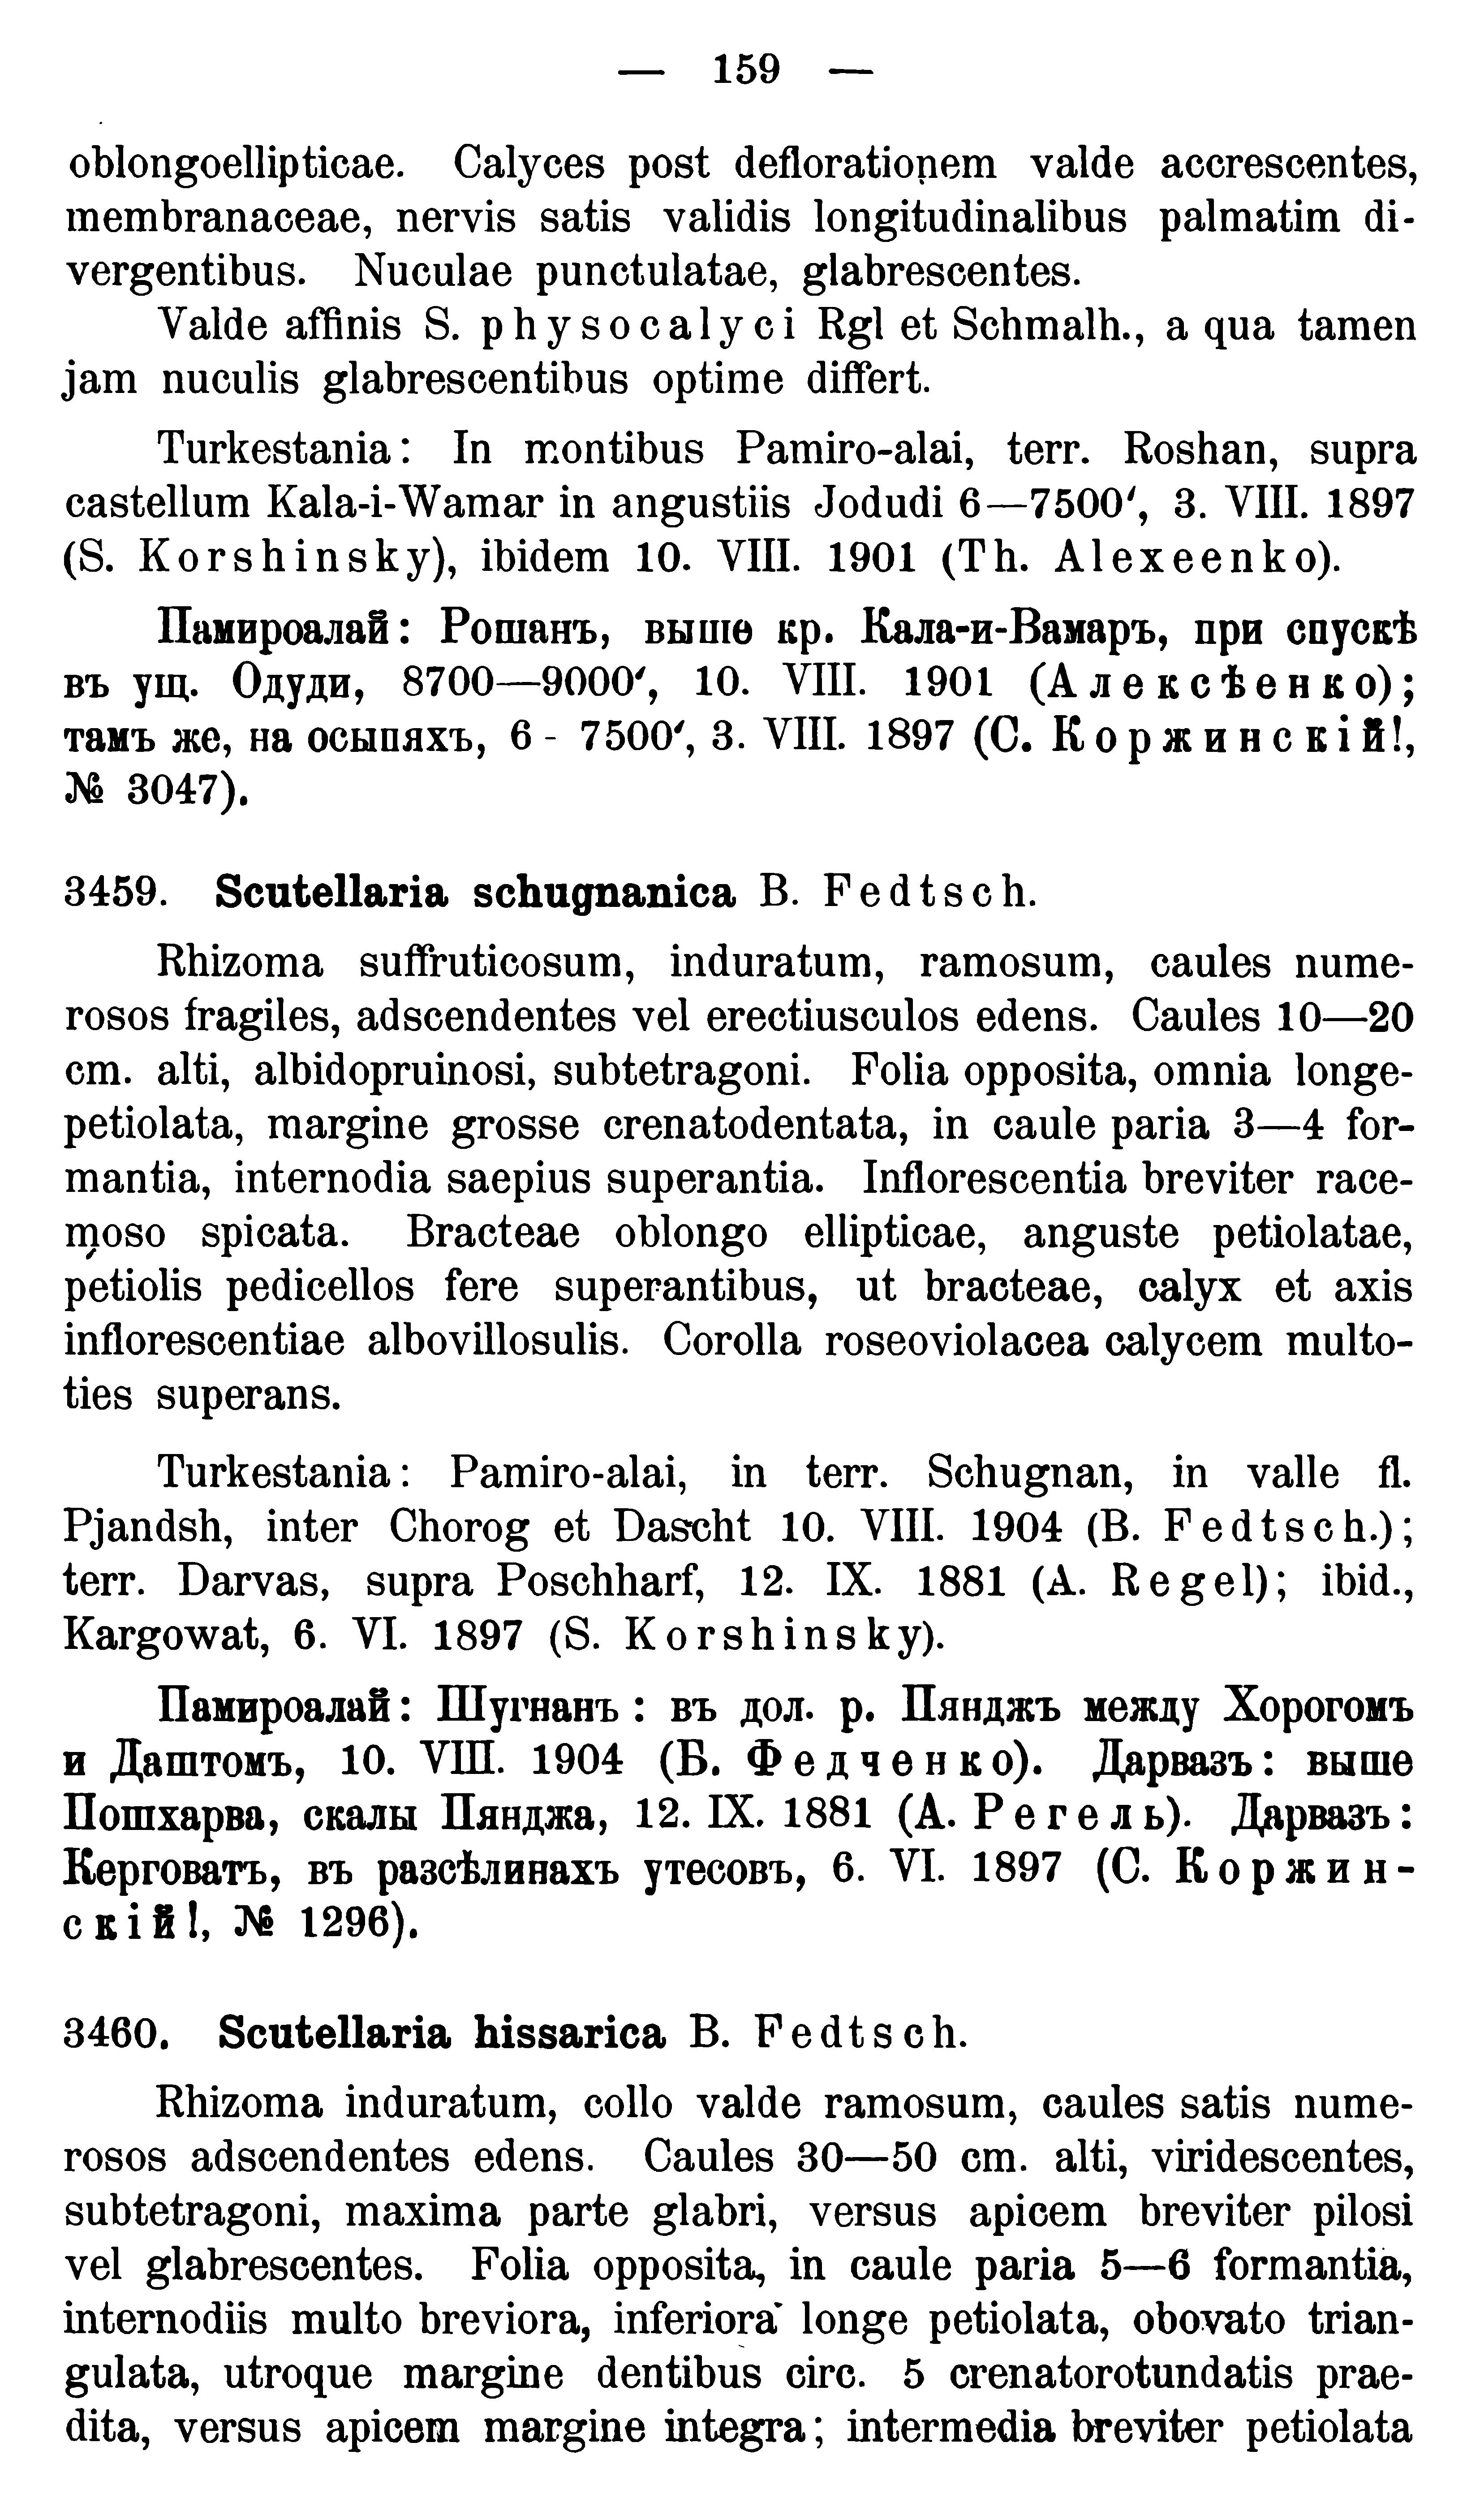 https://forum.plantarium.ru/misc.php?action=pun_attachment&item=26627&download=0